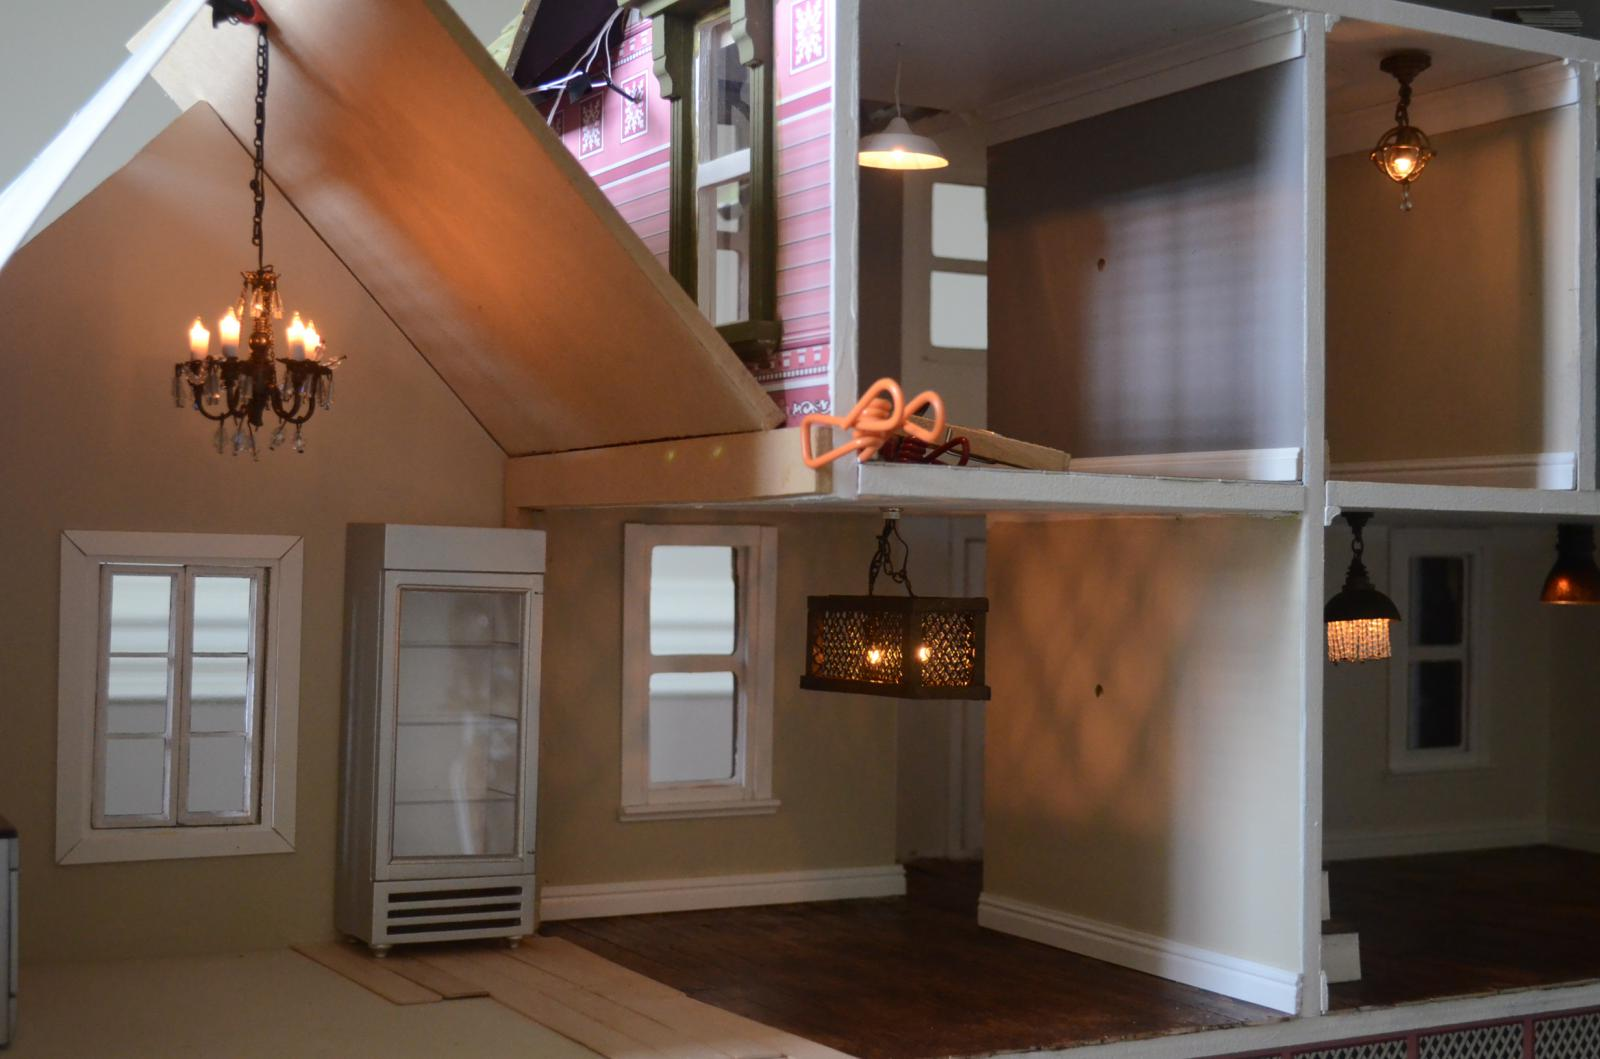 Industrial Dollhouse Lighting-DIY & Industrial Dollhouse Lighting-DIY - Membersu0027 Gallery - The Greenleaf ...